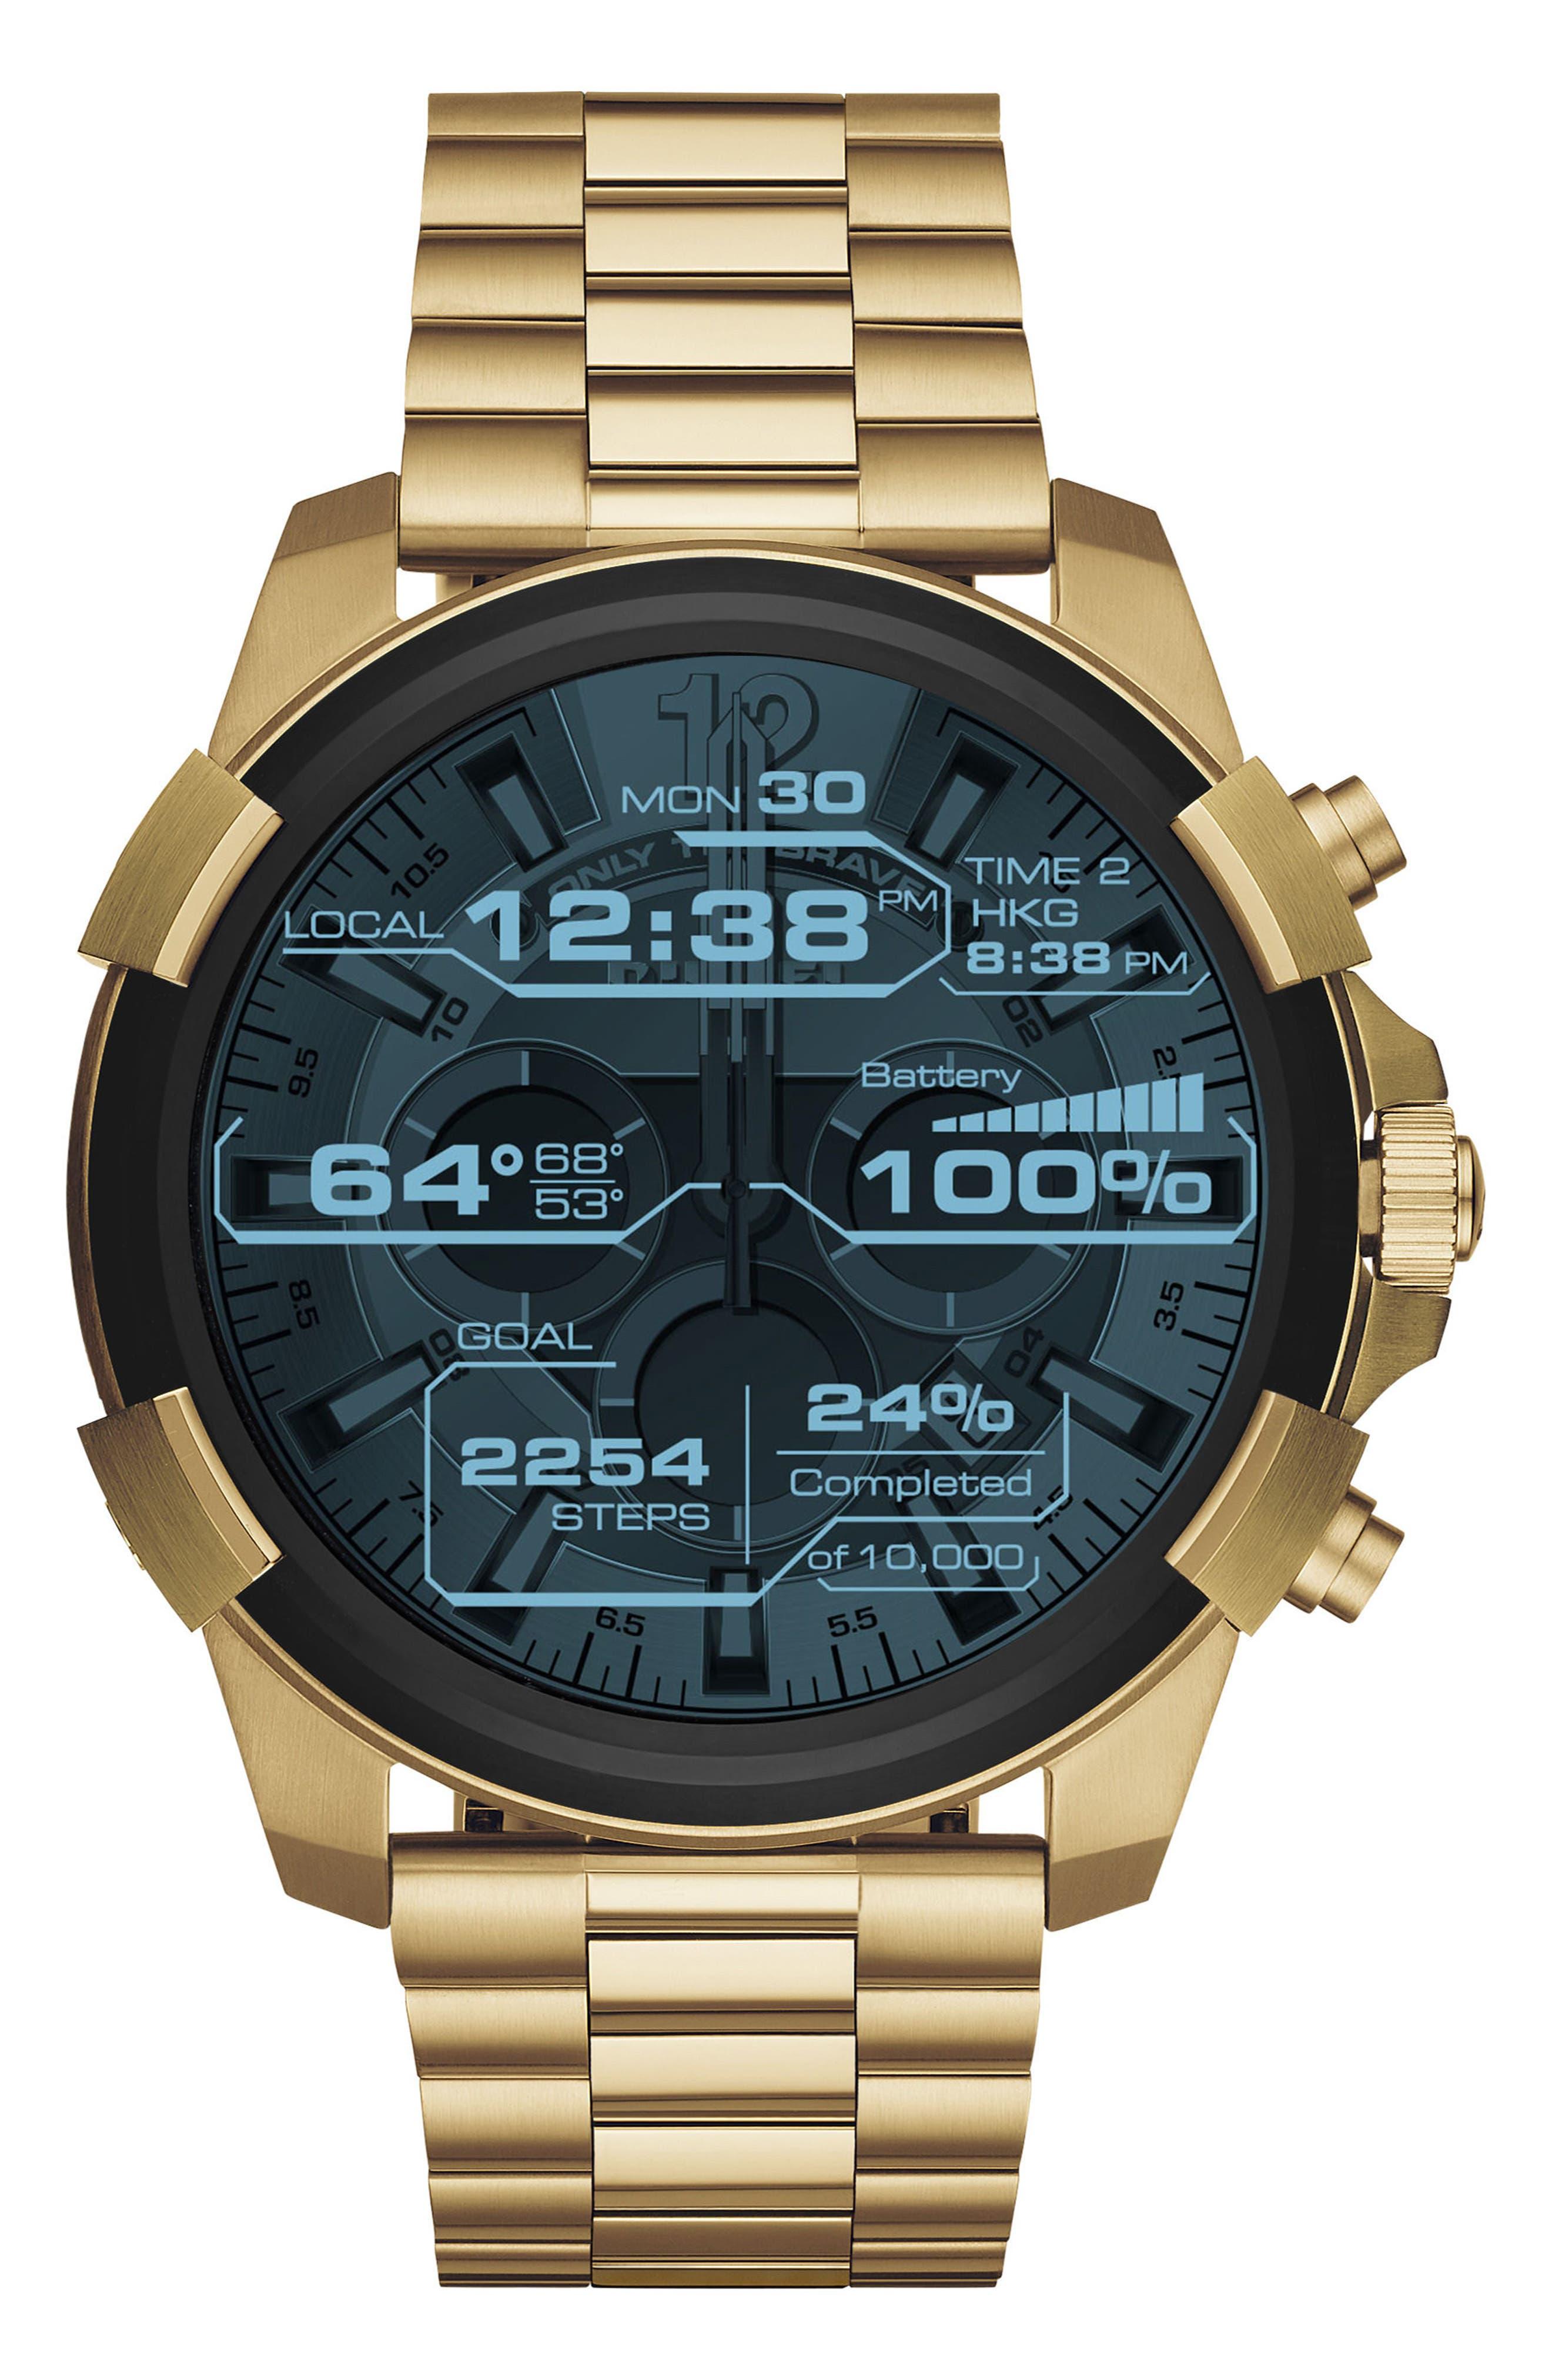 Full Guard Touchscreen Bracelet Smartwatch, 48mm x 54mm,                         Main,                         color, Gold Tone/ Black